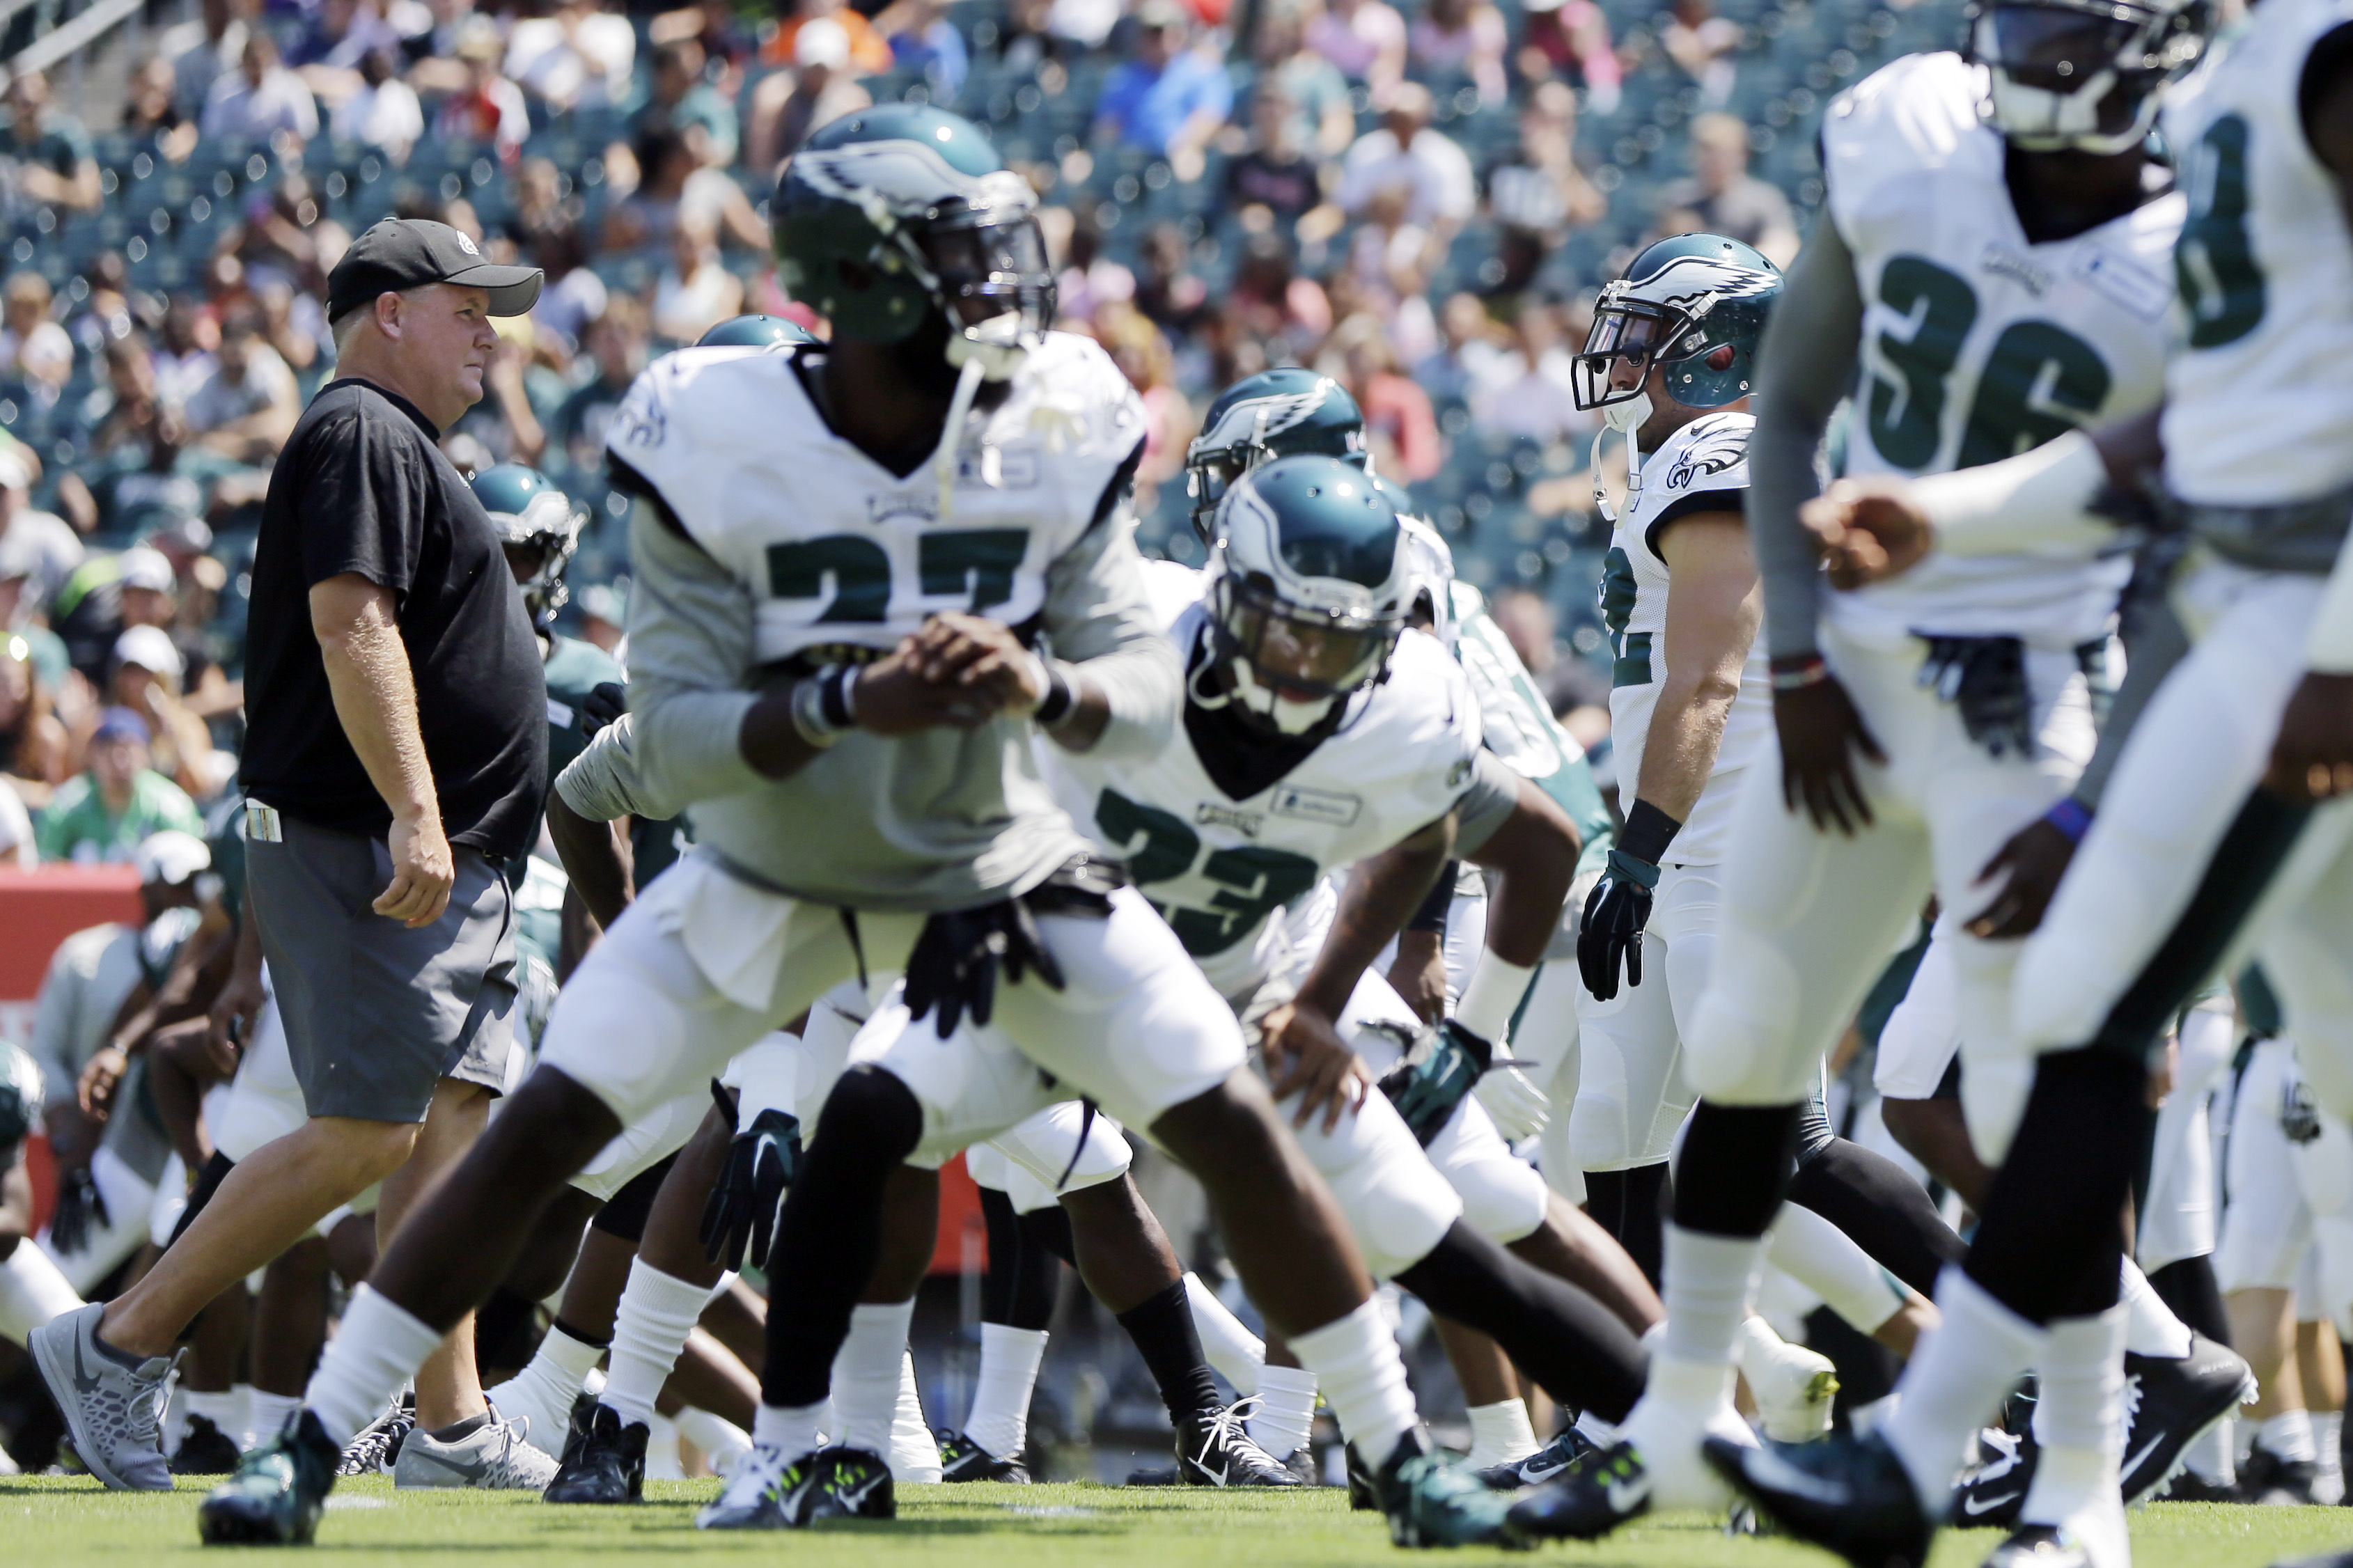 Philadelphia Eagles head coach Chip Kelly, left, walks the field during practice at NFL football training camp, Tuesday, Aug. 4, 2015, in Philadelphia. (AP Photo/Matt Rourke)